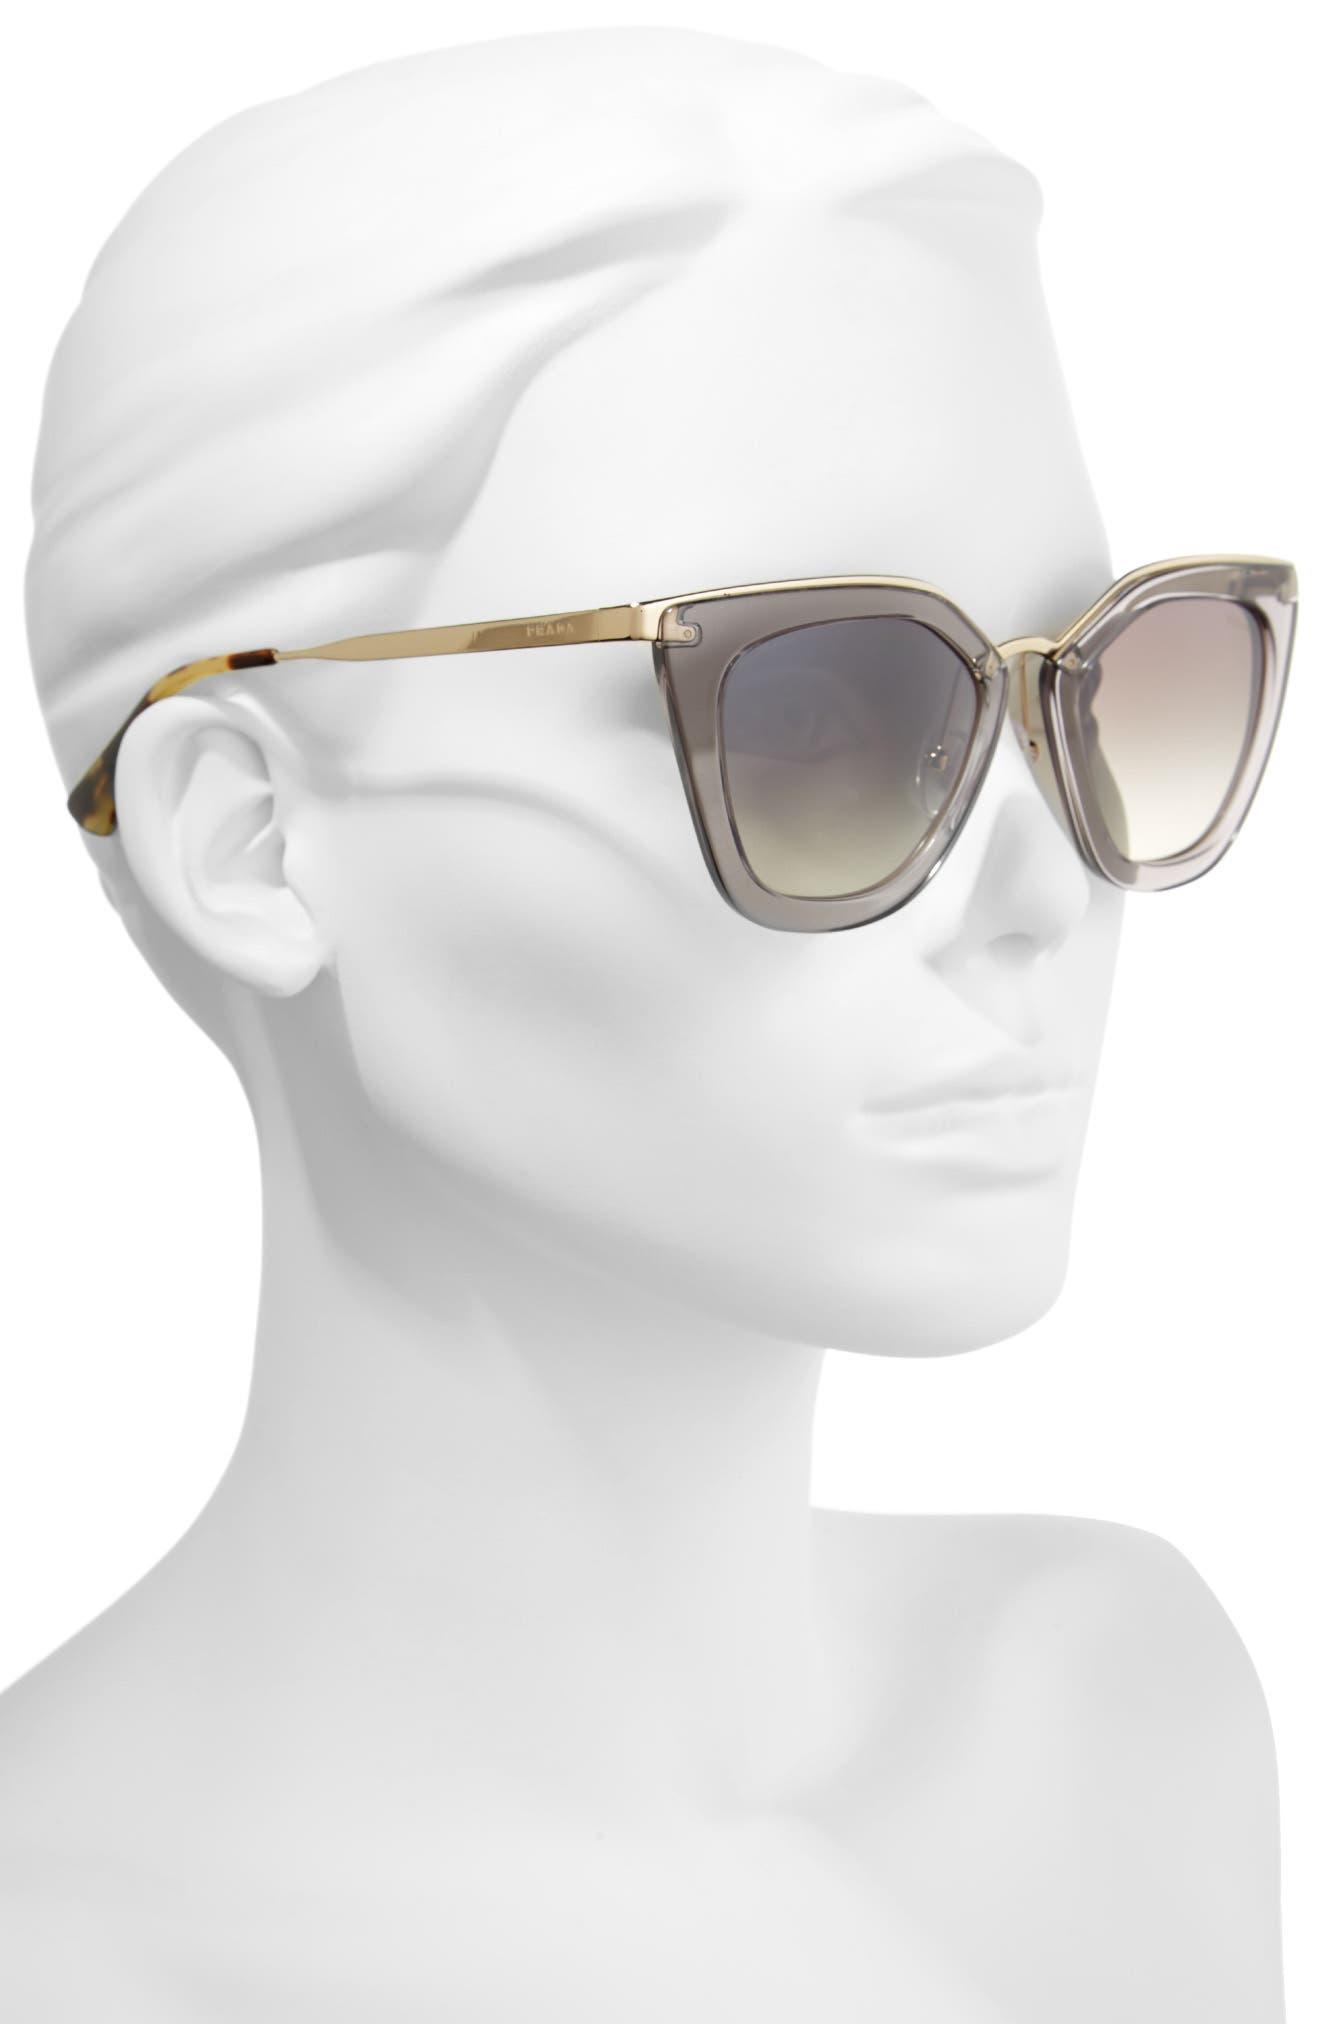 52mm Gradient Cat Eye Sunglasses,                             Alternate thumbnail 2, color,                             020